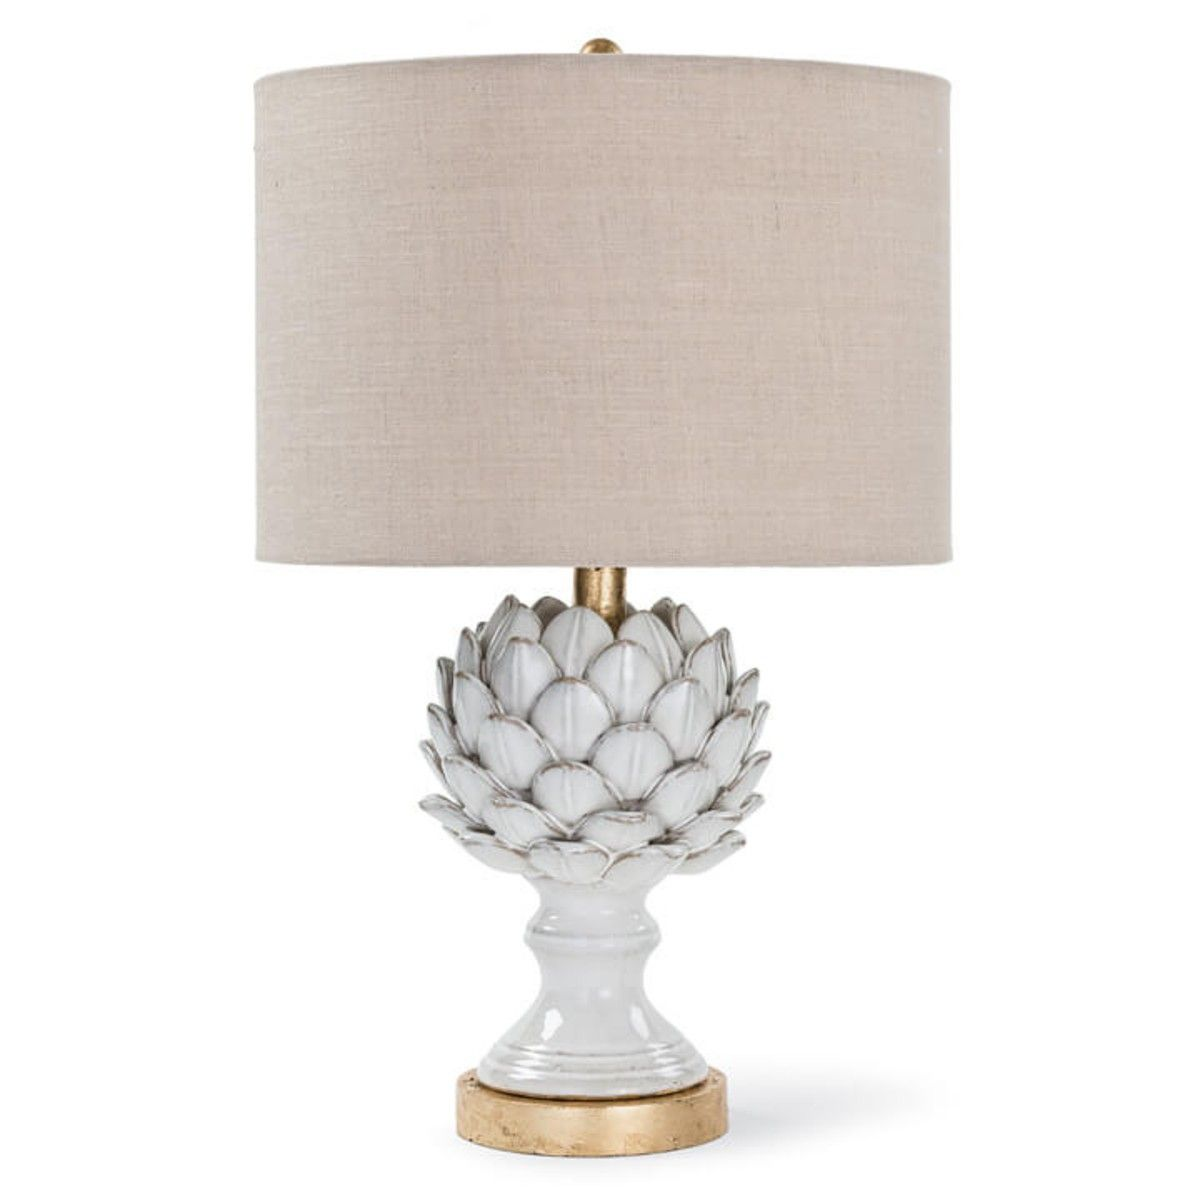 Dorma Artichoke Table Lamp Grey | Dunelm